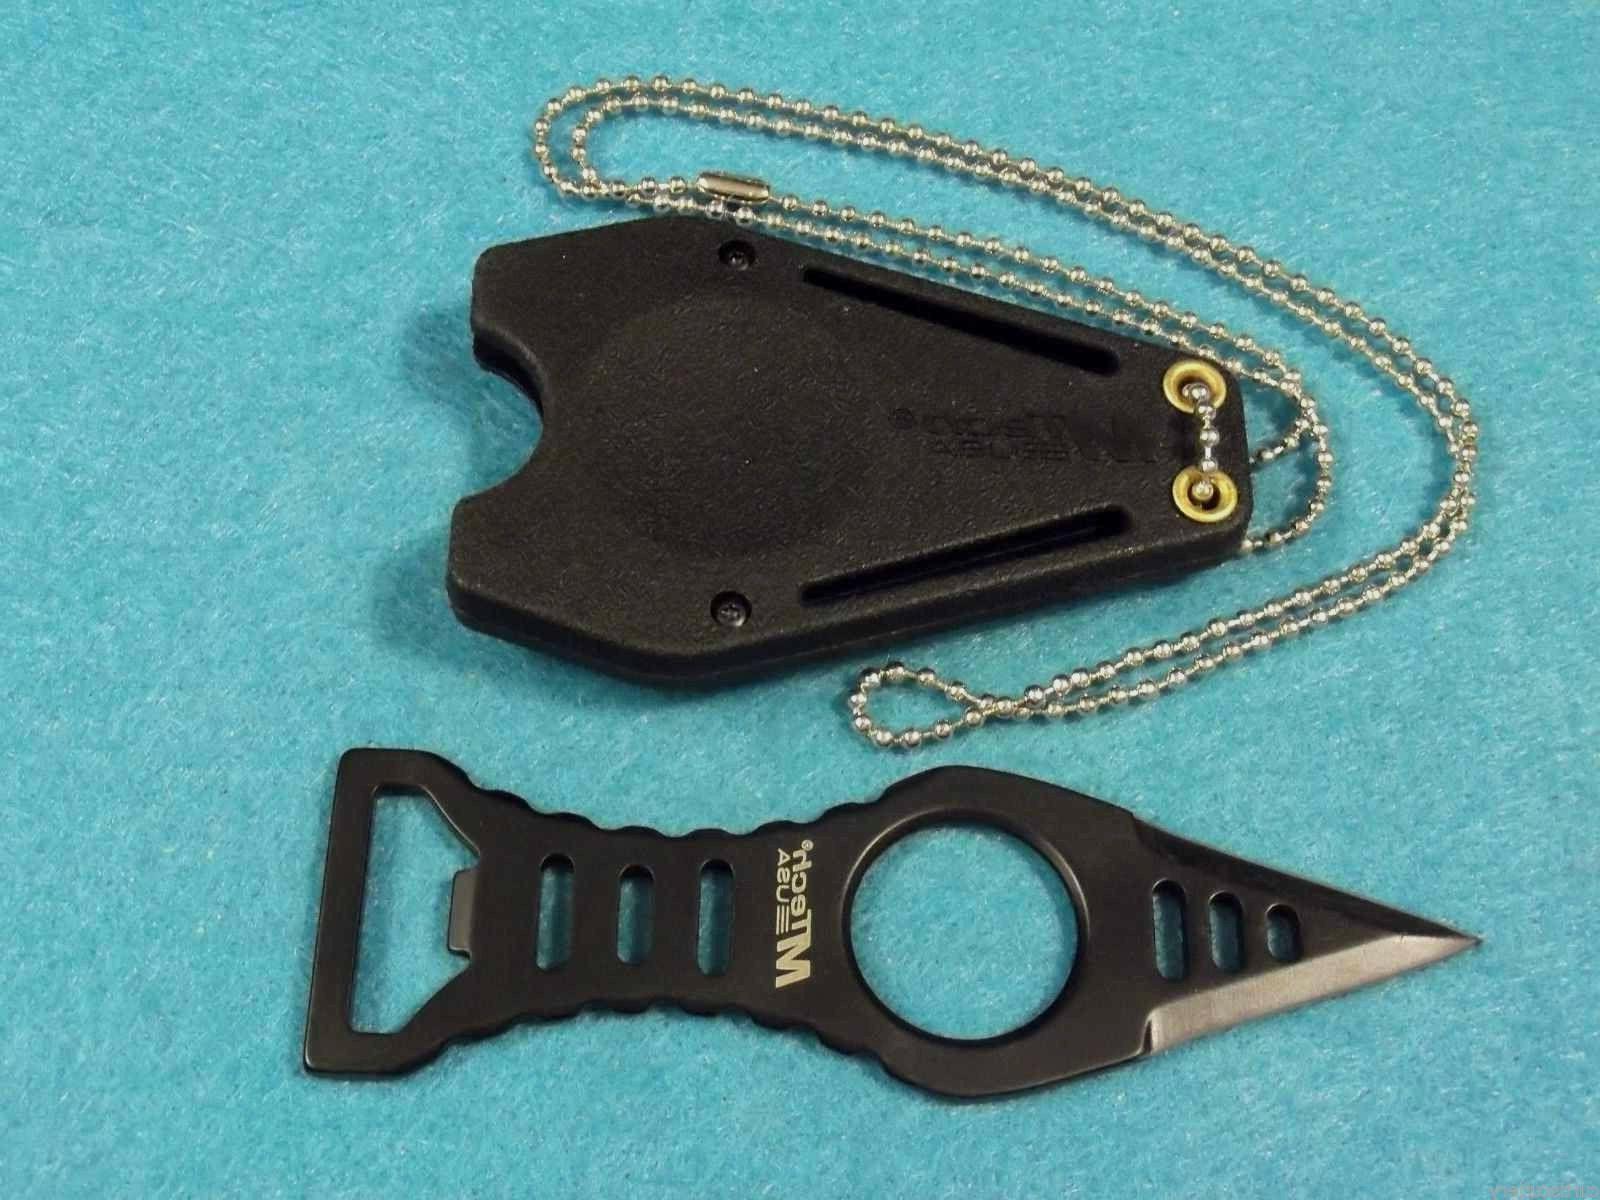 mt 20 27b neck knife